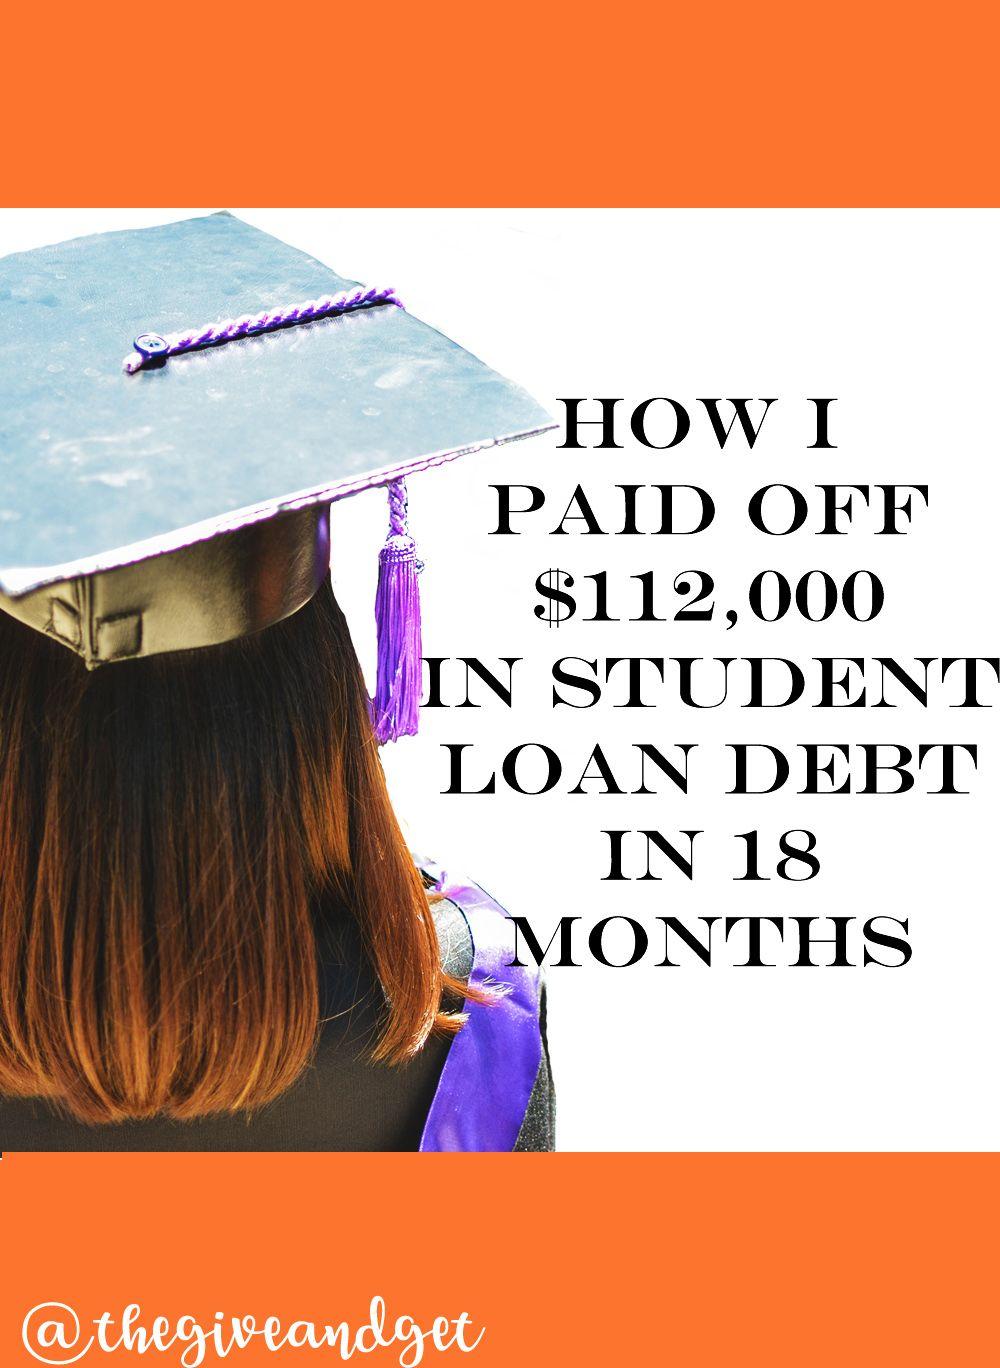 71b46d2a940b083a218bb7ceb8695692 - How To Get A Loan If You Are Under 18